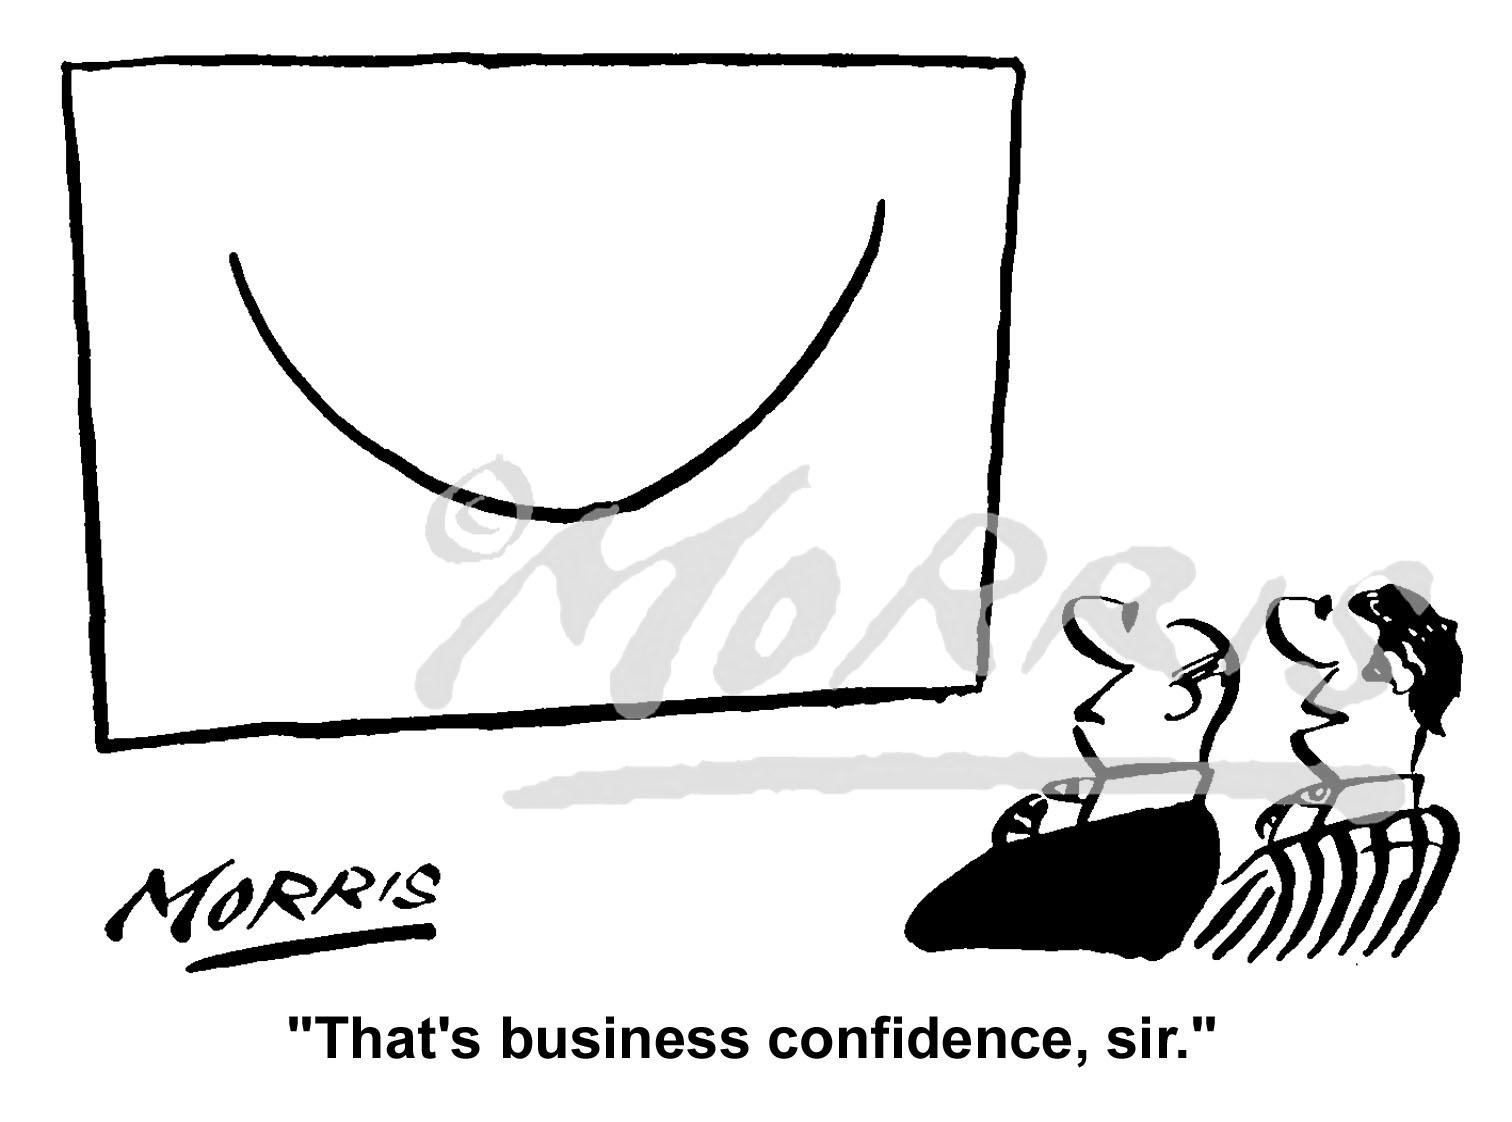 Business confidence cartoon, office comic – Ref 1660bw